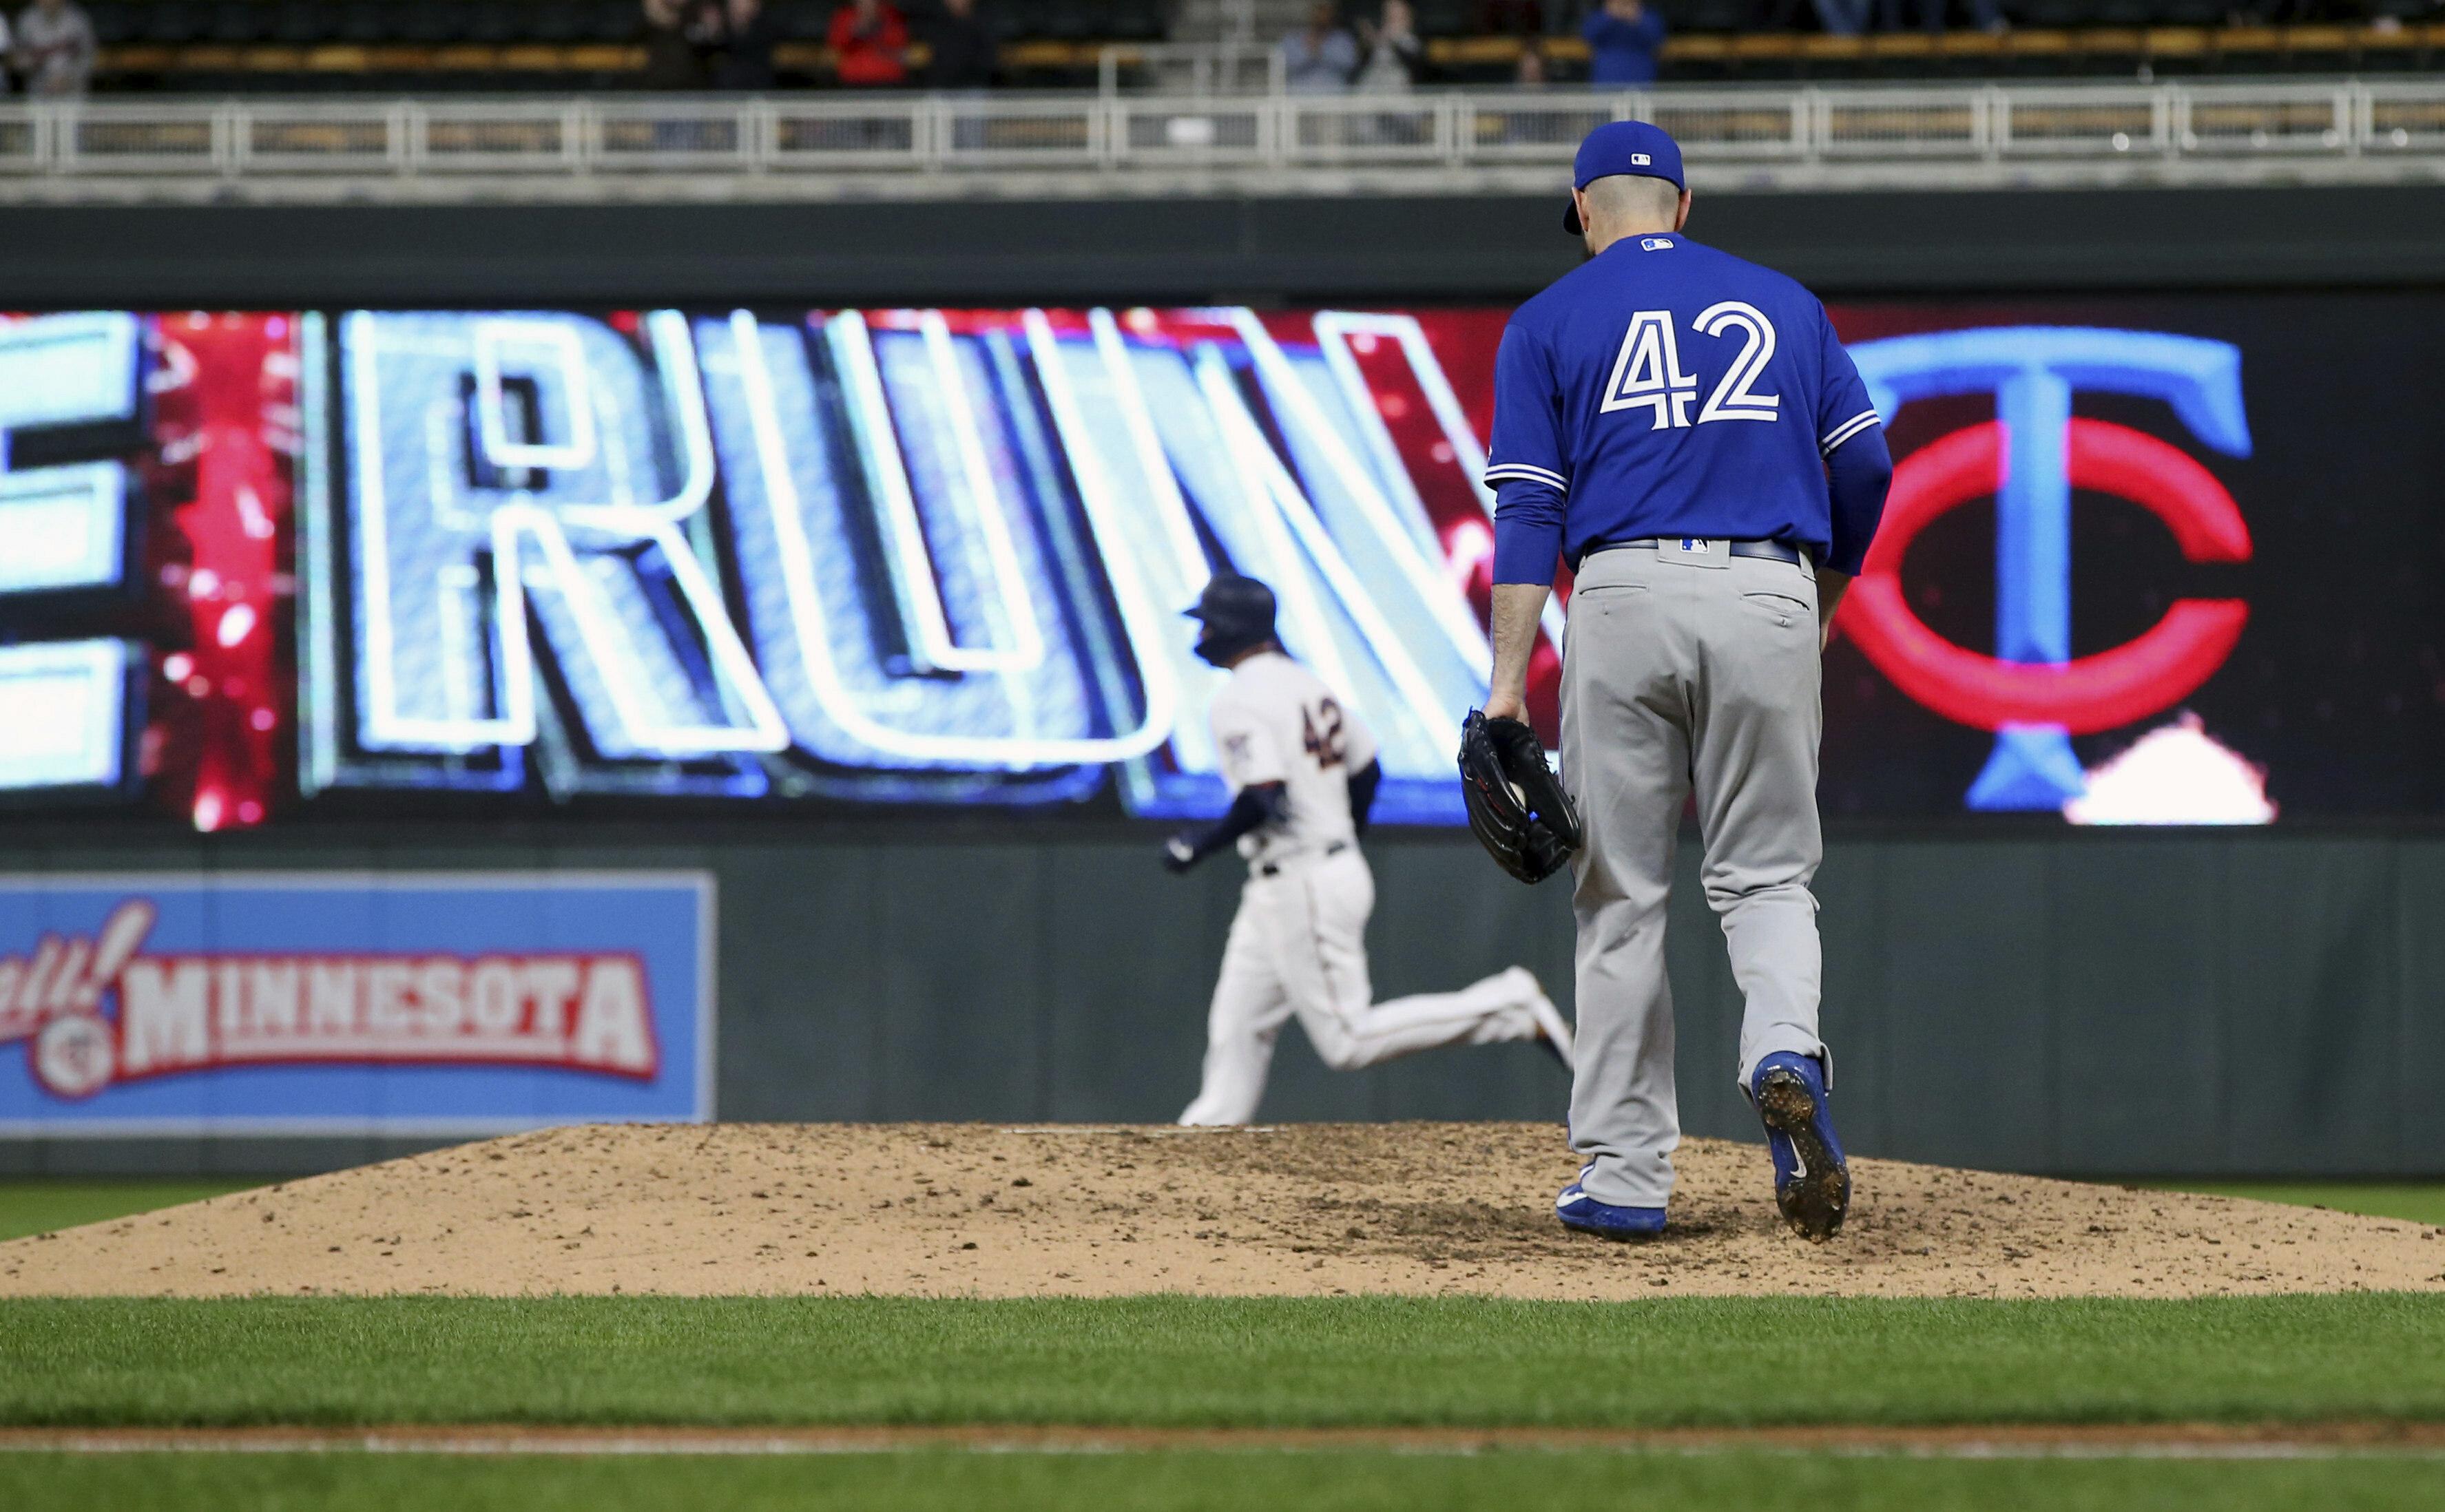 Hernandez's 3-run homer lifts Blue Jays past Twins 5-3